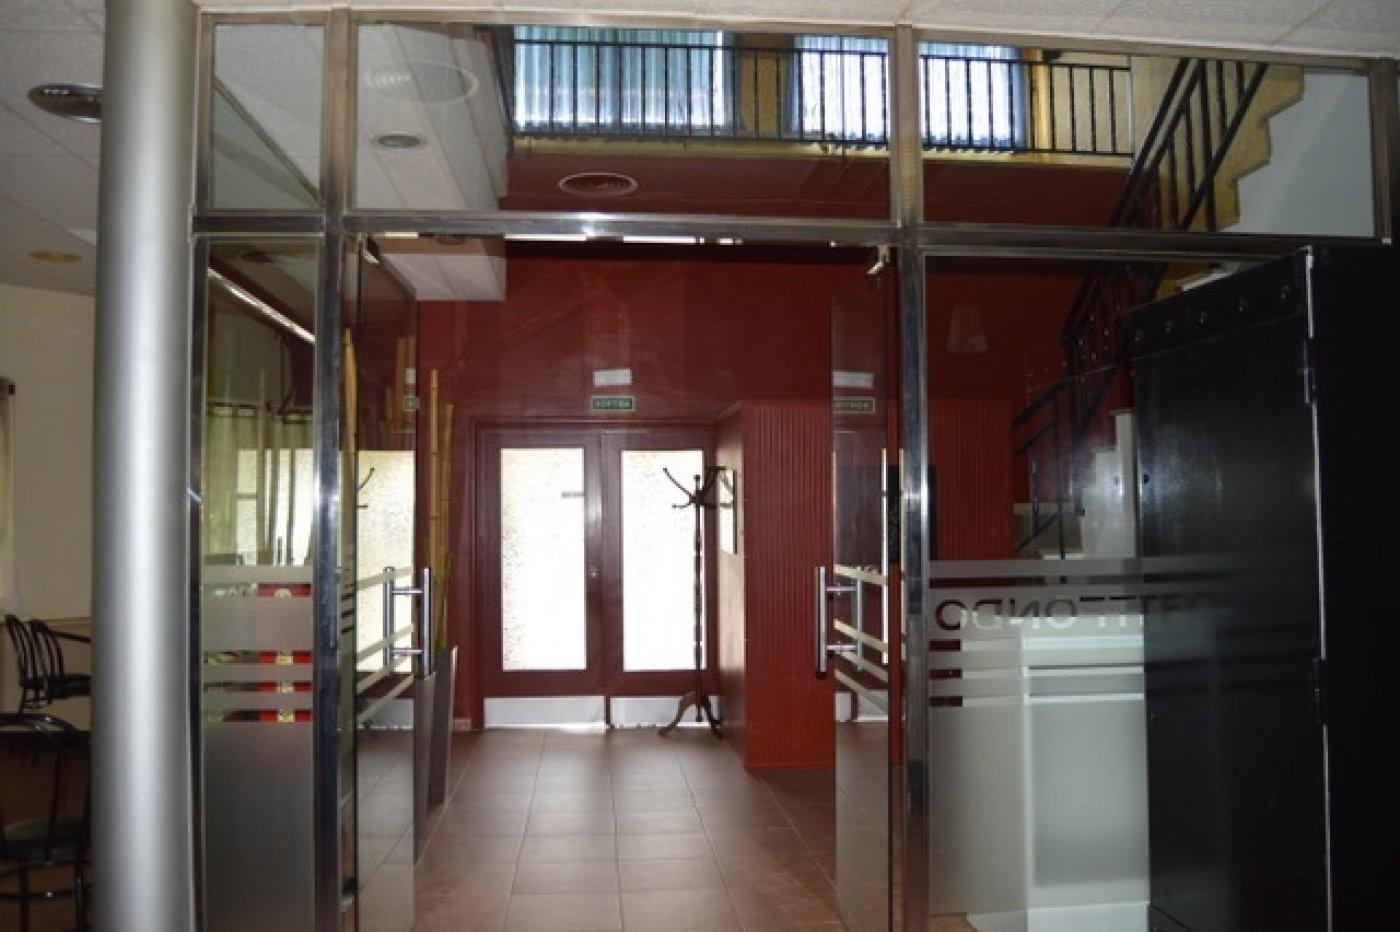 Nave restaurante en polígono cerca de sant sadurní d´anoia - imagenInmueble15